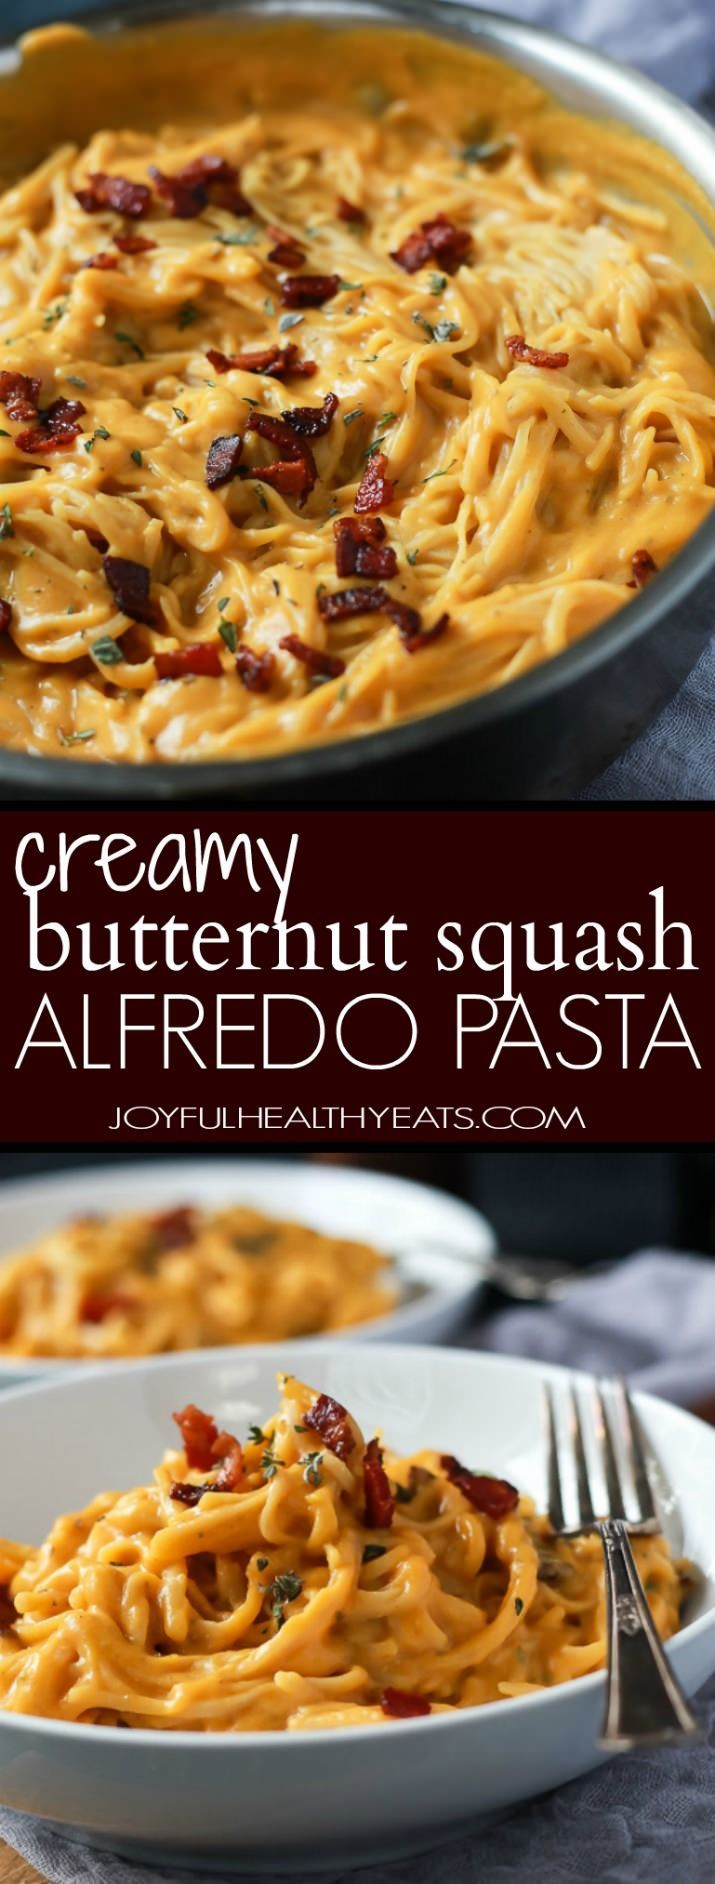 Creamy Butternut Squash Pasta + Bacon   Easy Butternut Squash Recipe